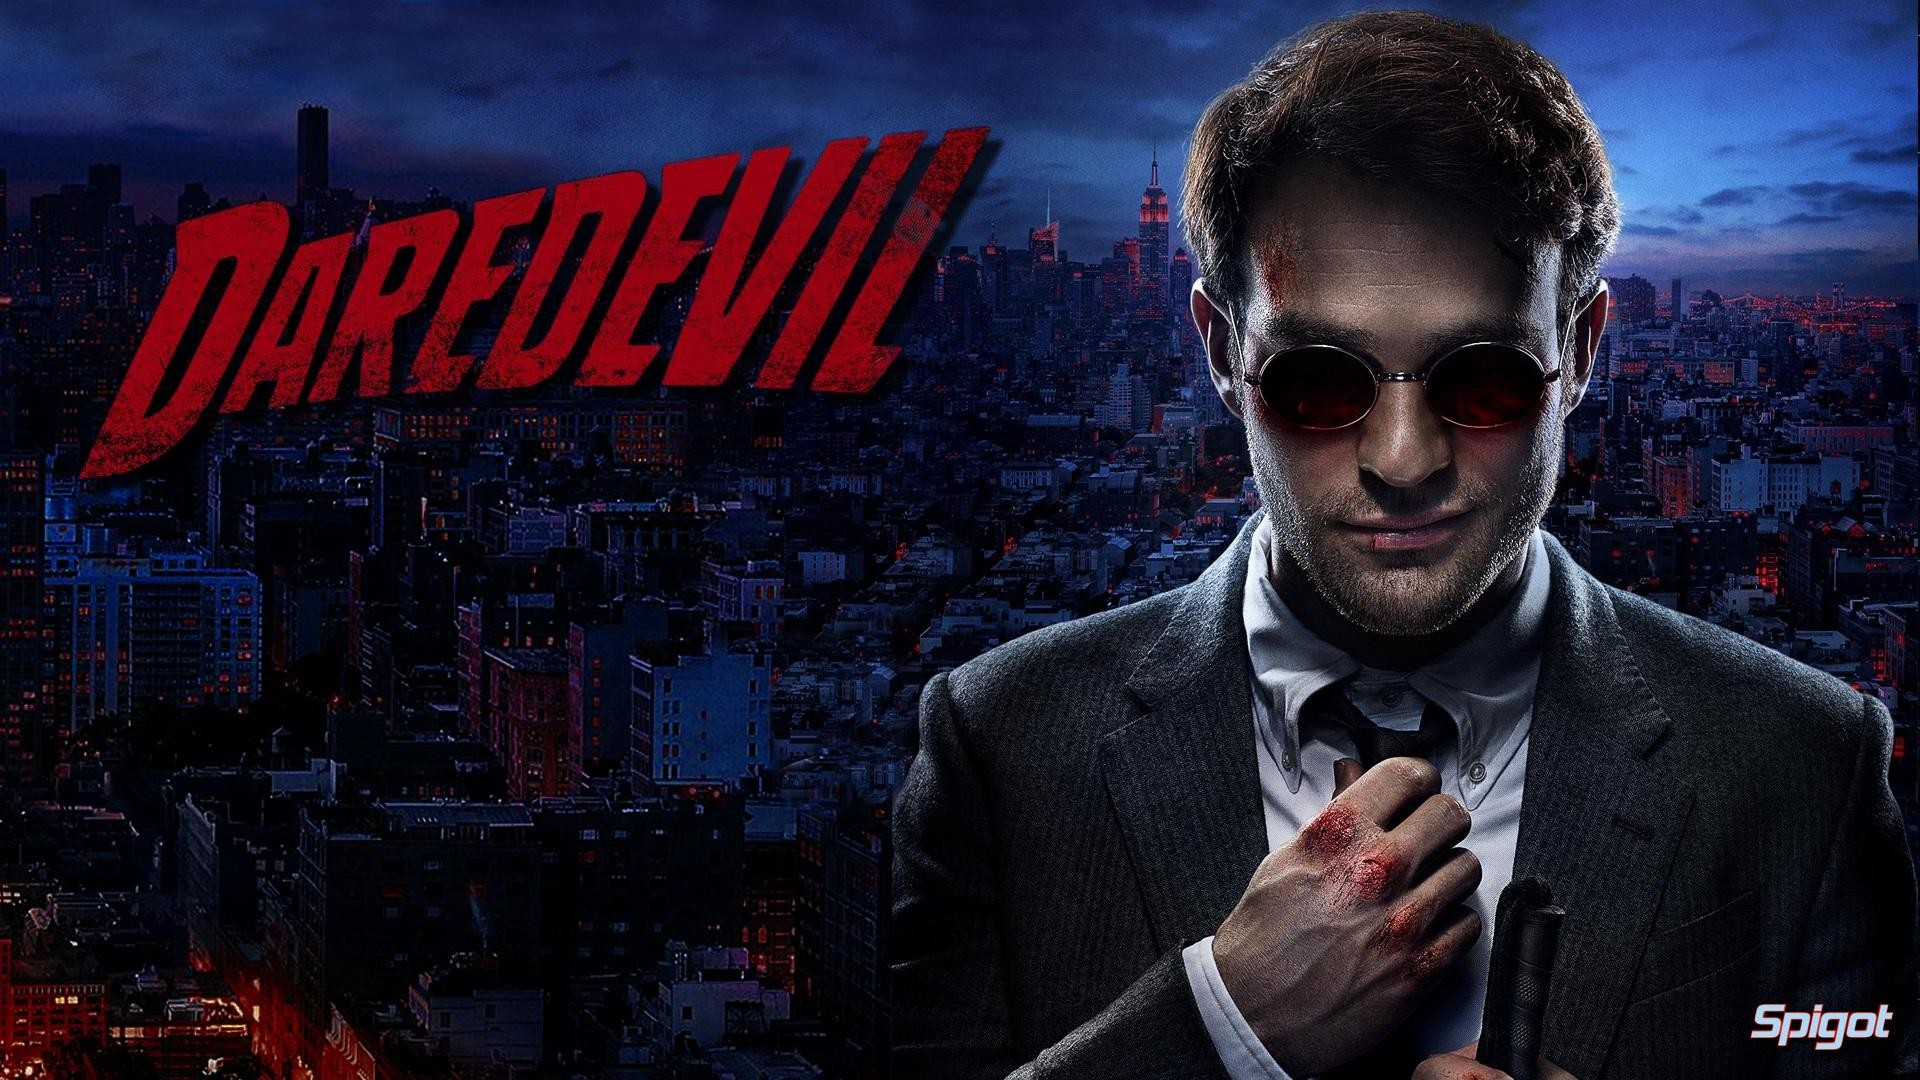 Daredevil-background-wallpaper